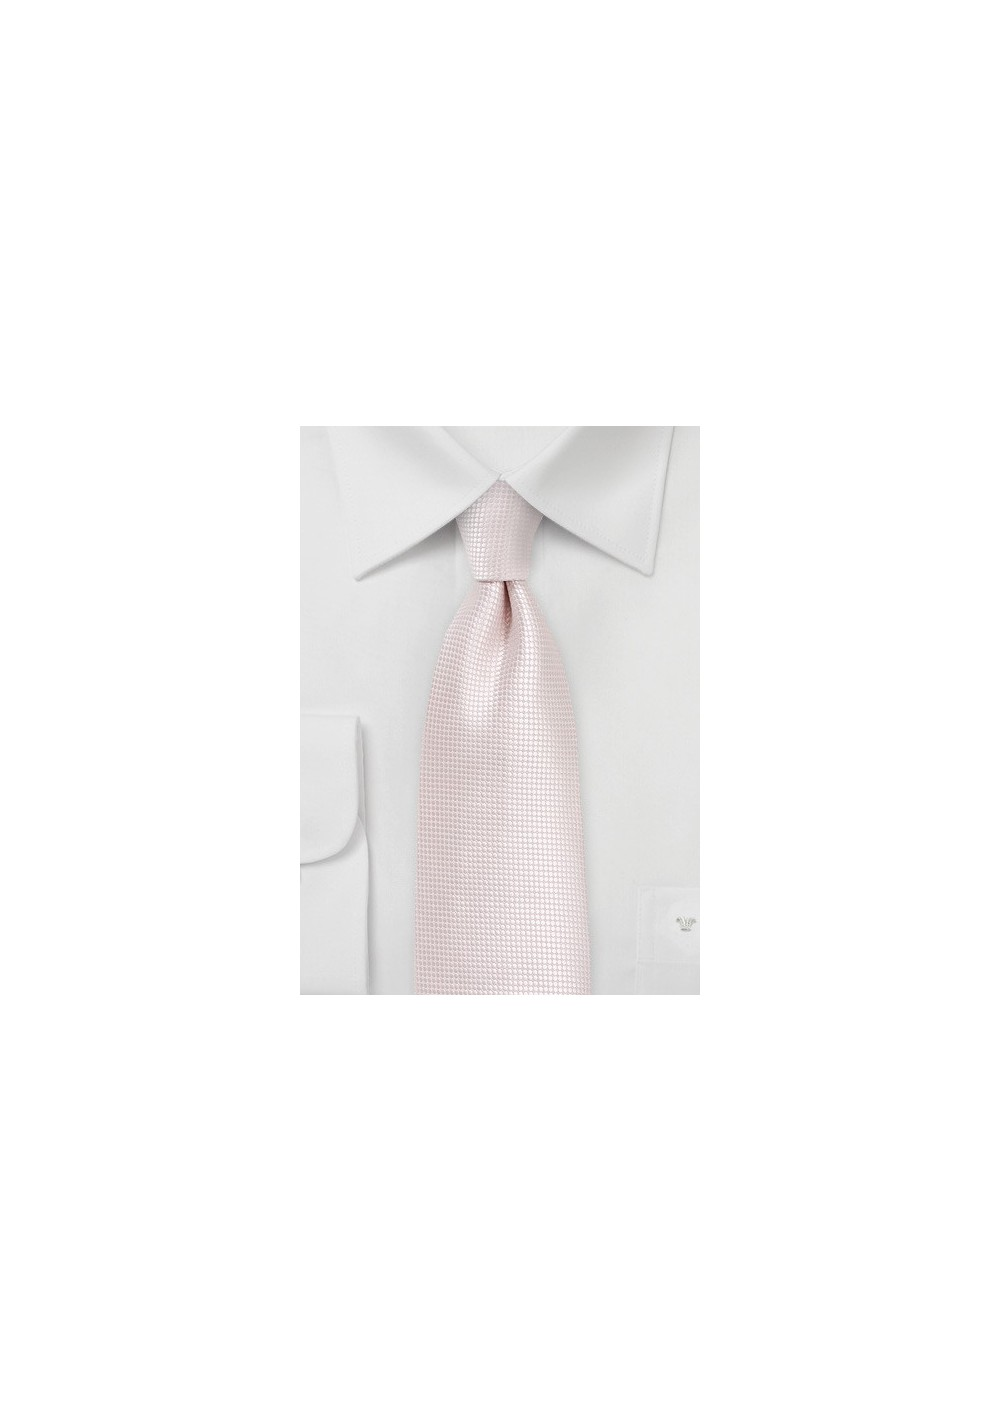 Kids Tie in Heavenly Pink